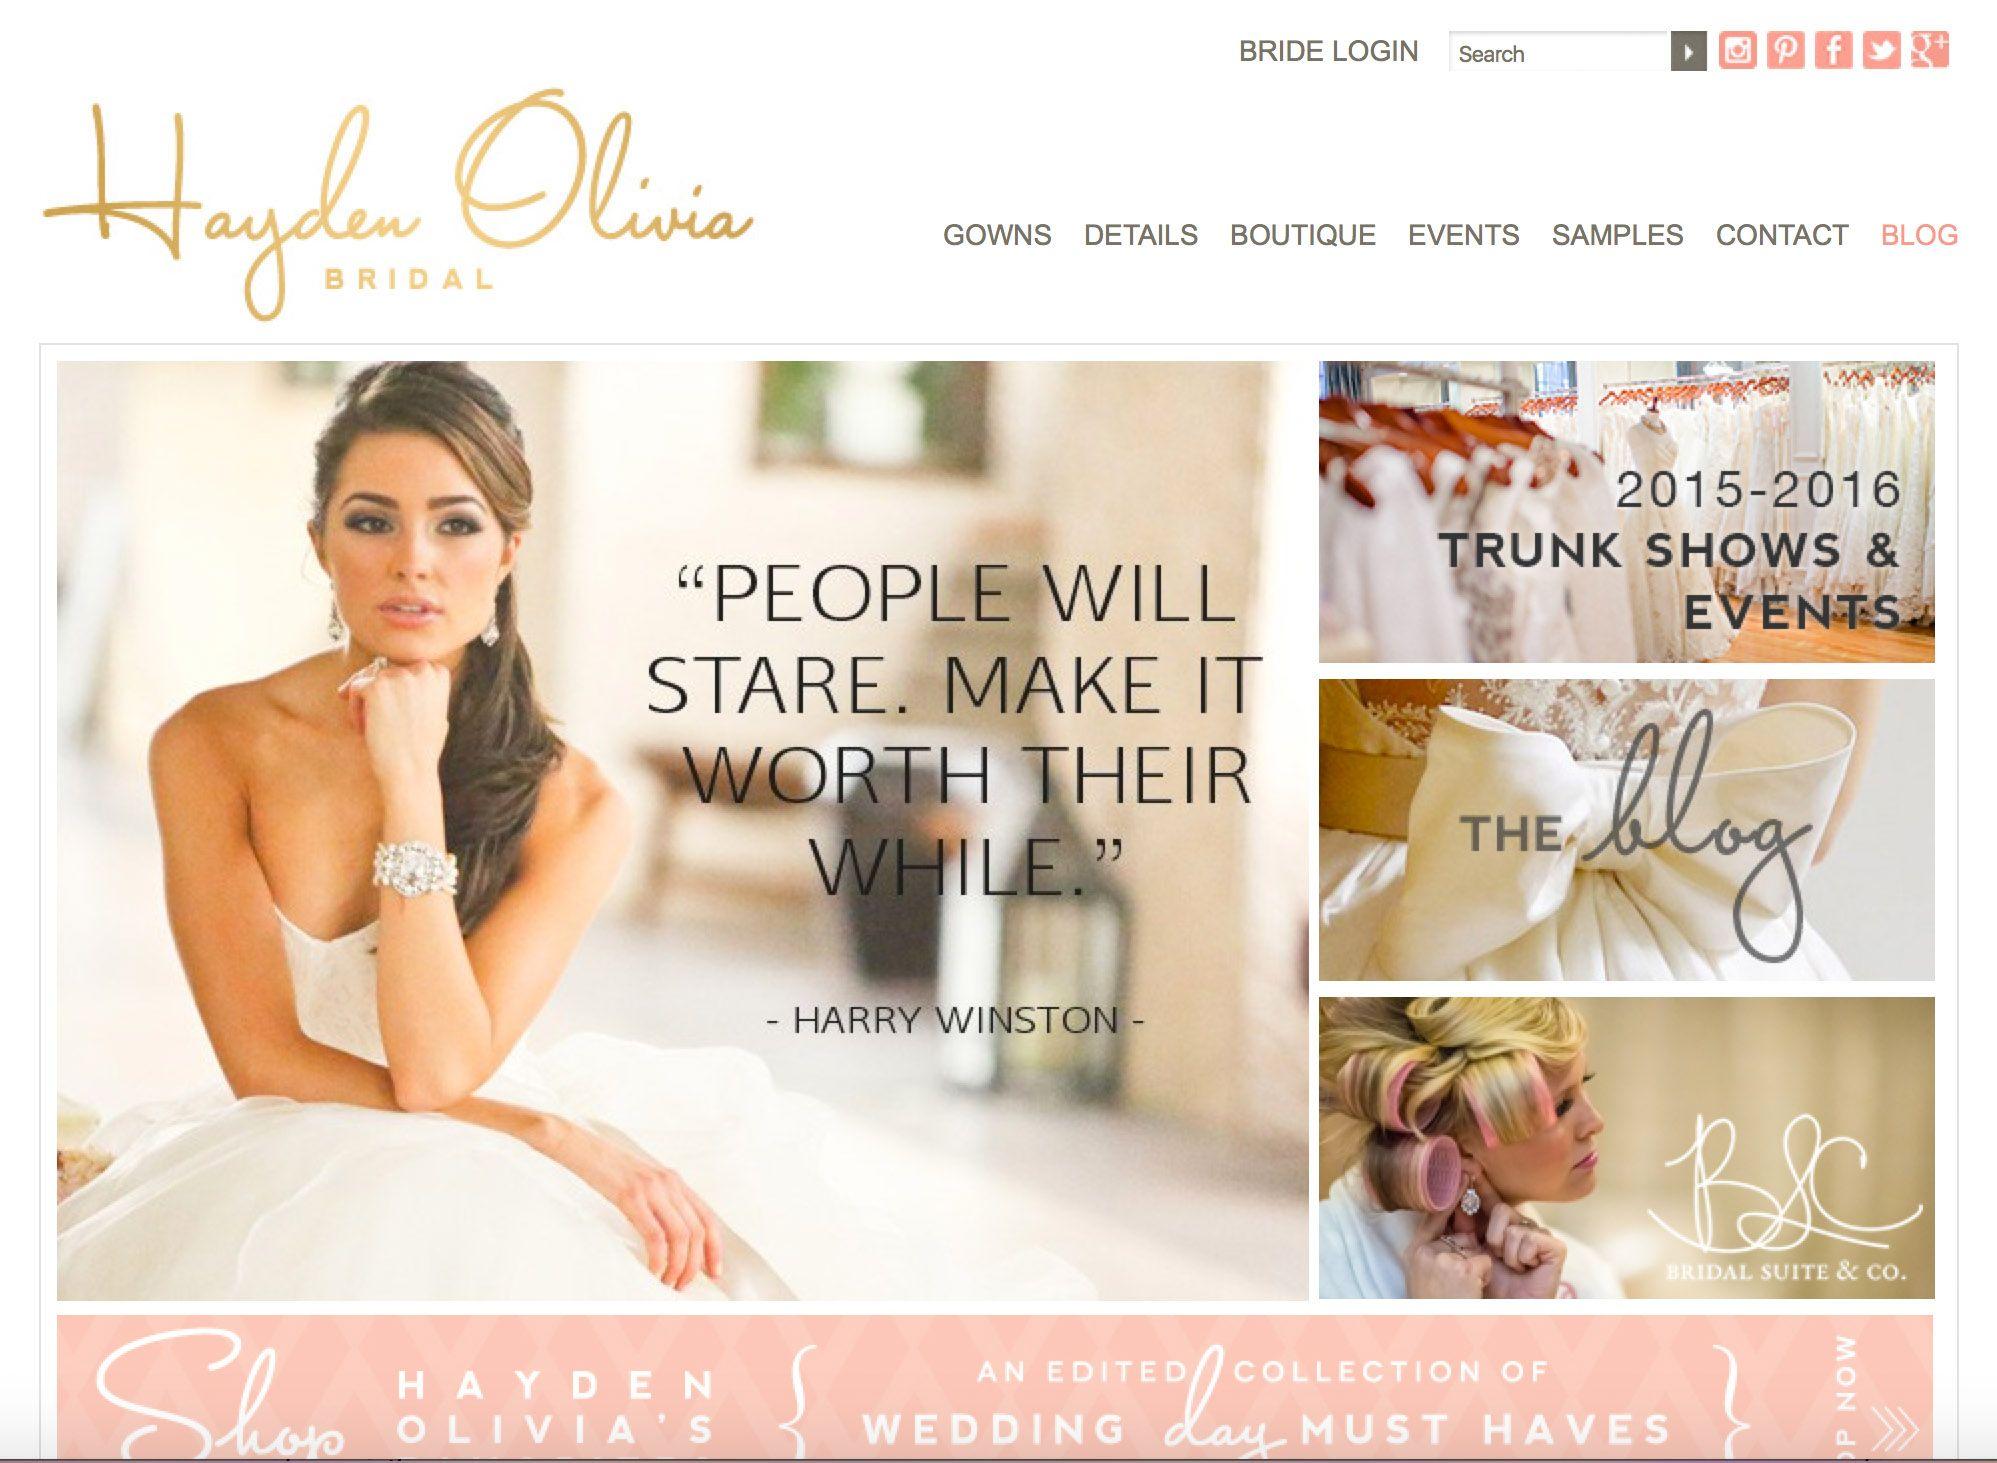 Hayden Olivia Bridal | Charlotte, NC Bridal Shop | Charlotte, NC ...